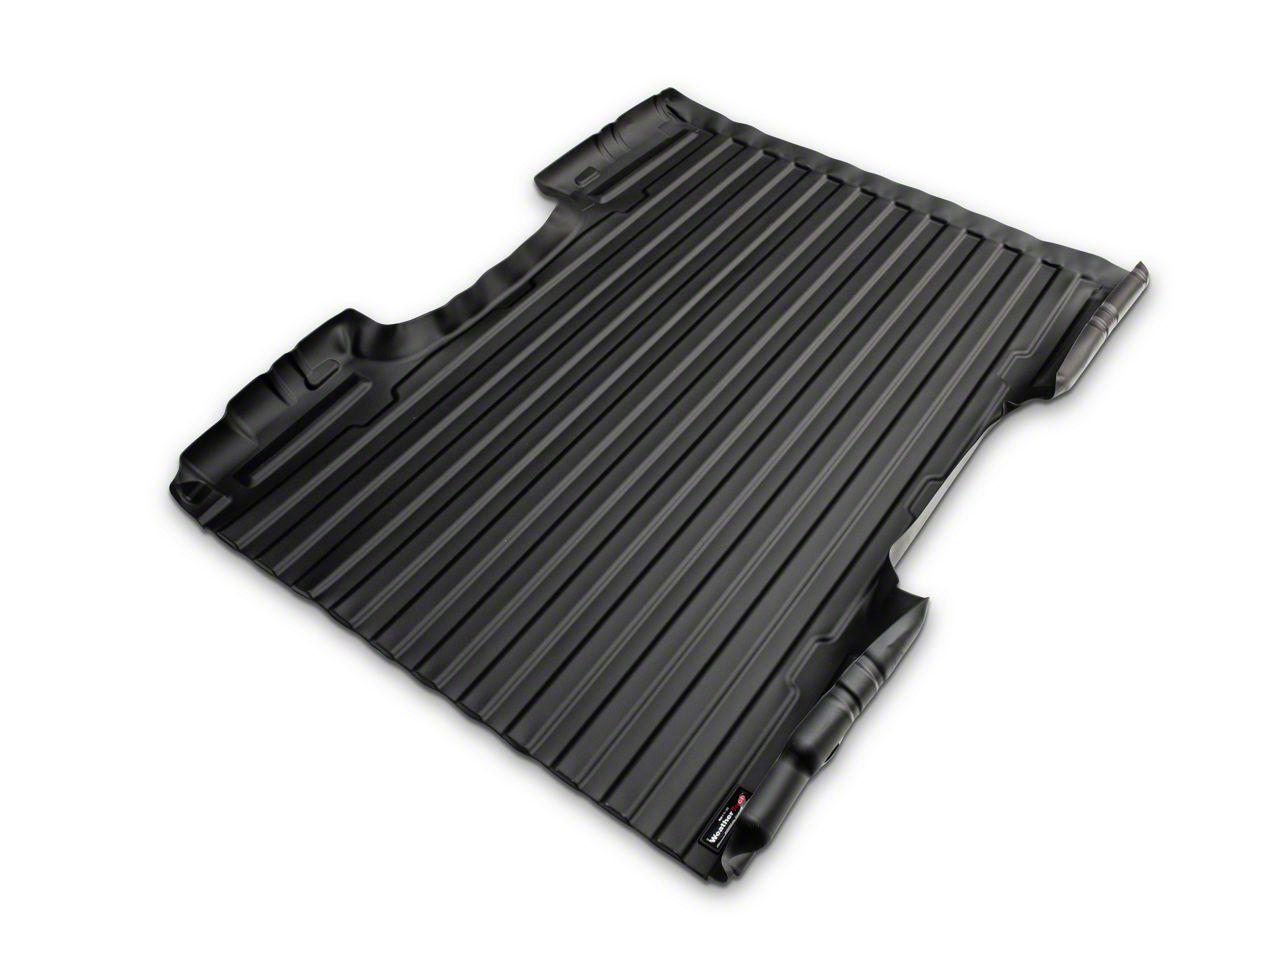 Weathertech TechLiner Bed Liner - Black (07-18 Sierra 1500 w/ Short Box)